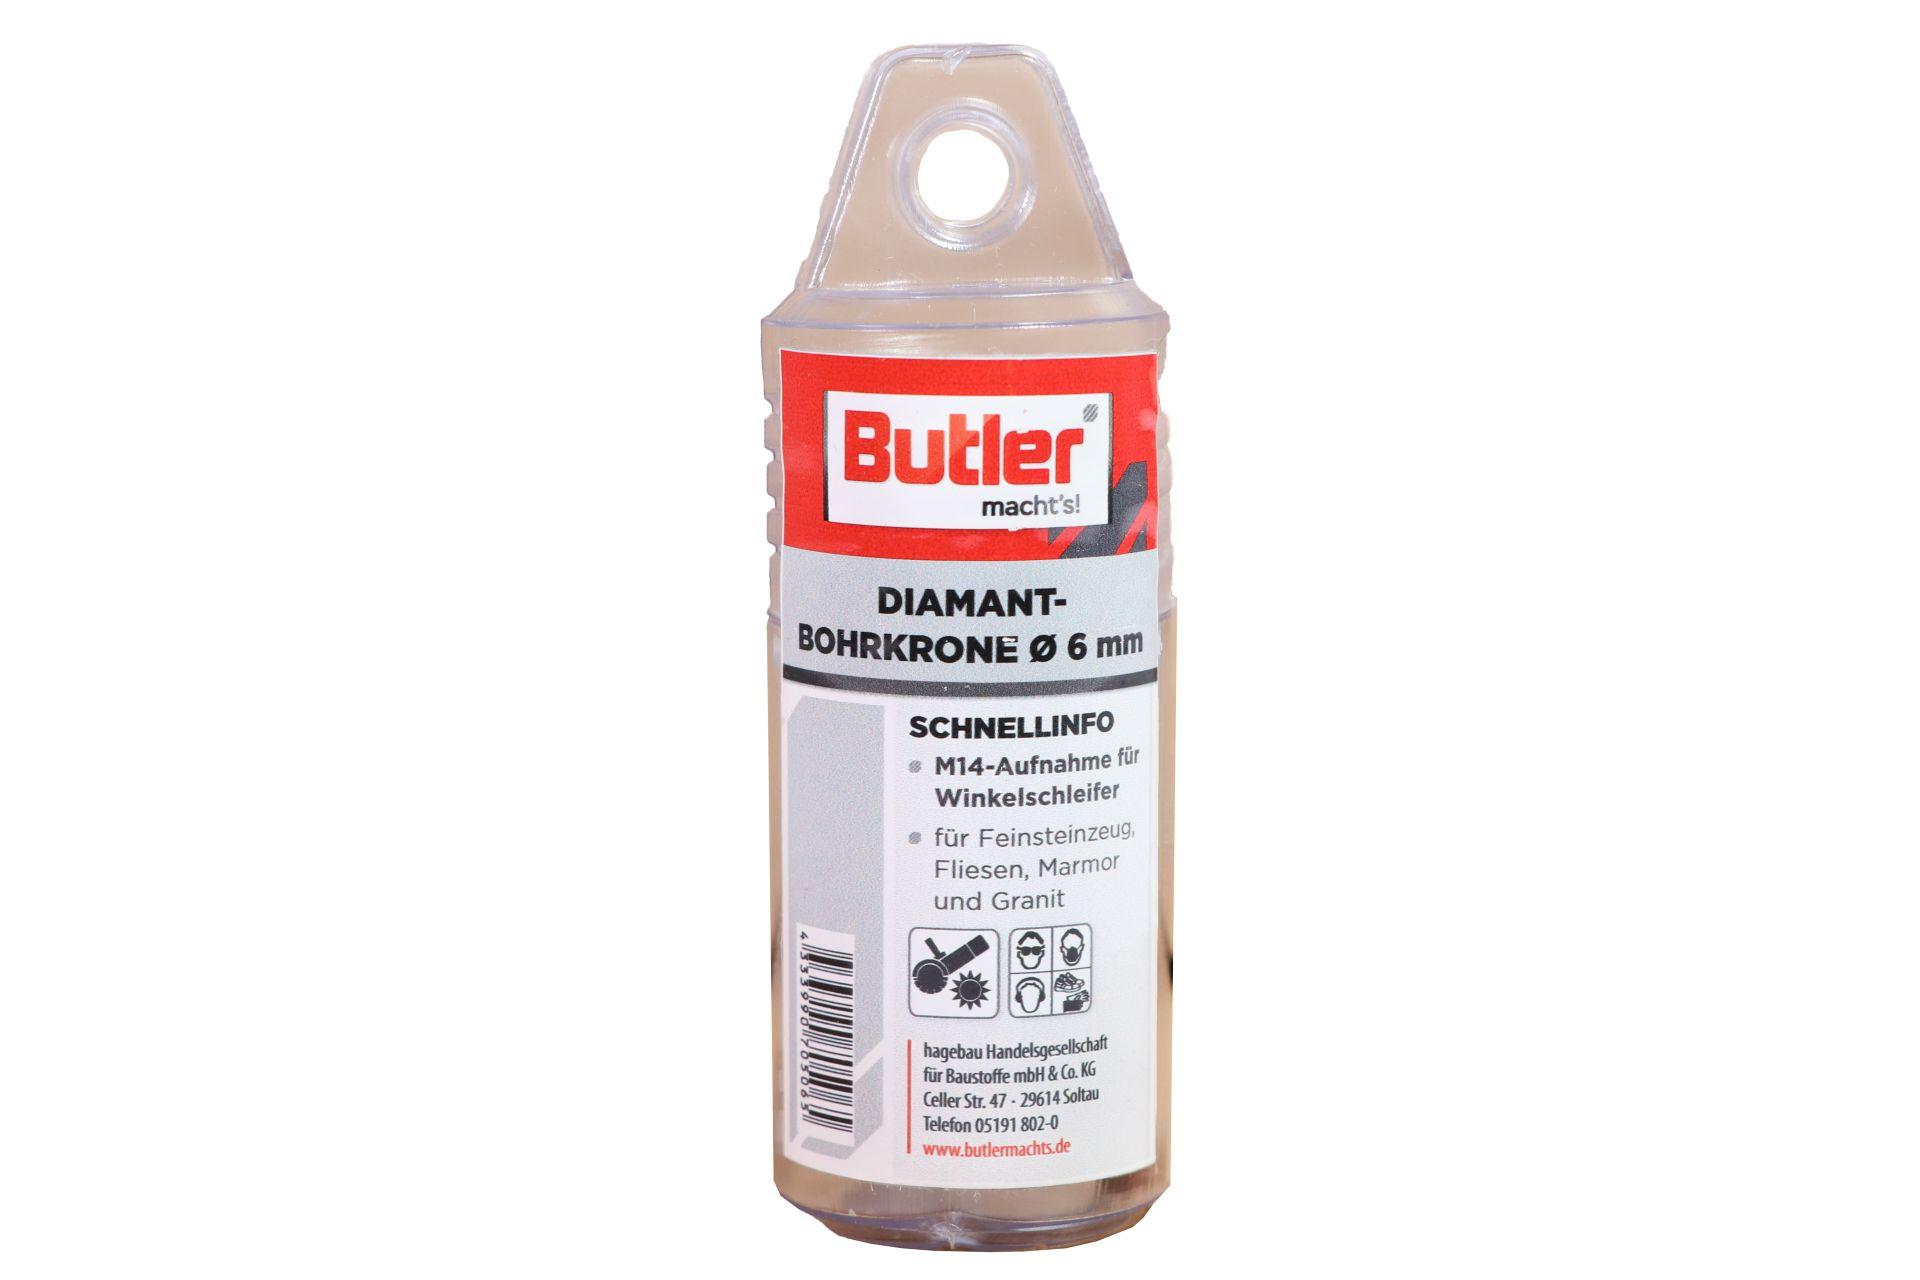 Butler macht's! Diamant-Bohrkrone, Ø 6 mm, Aufnahme M14, Bohrtiefe 35 mm